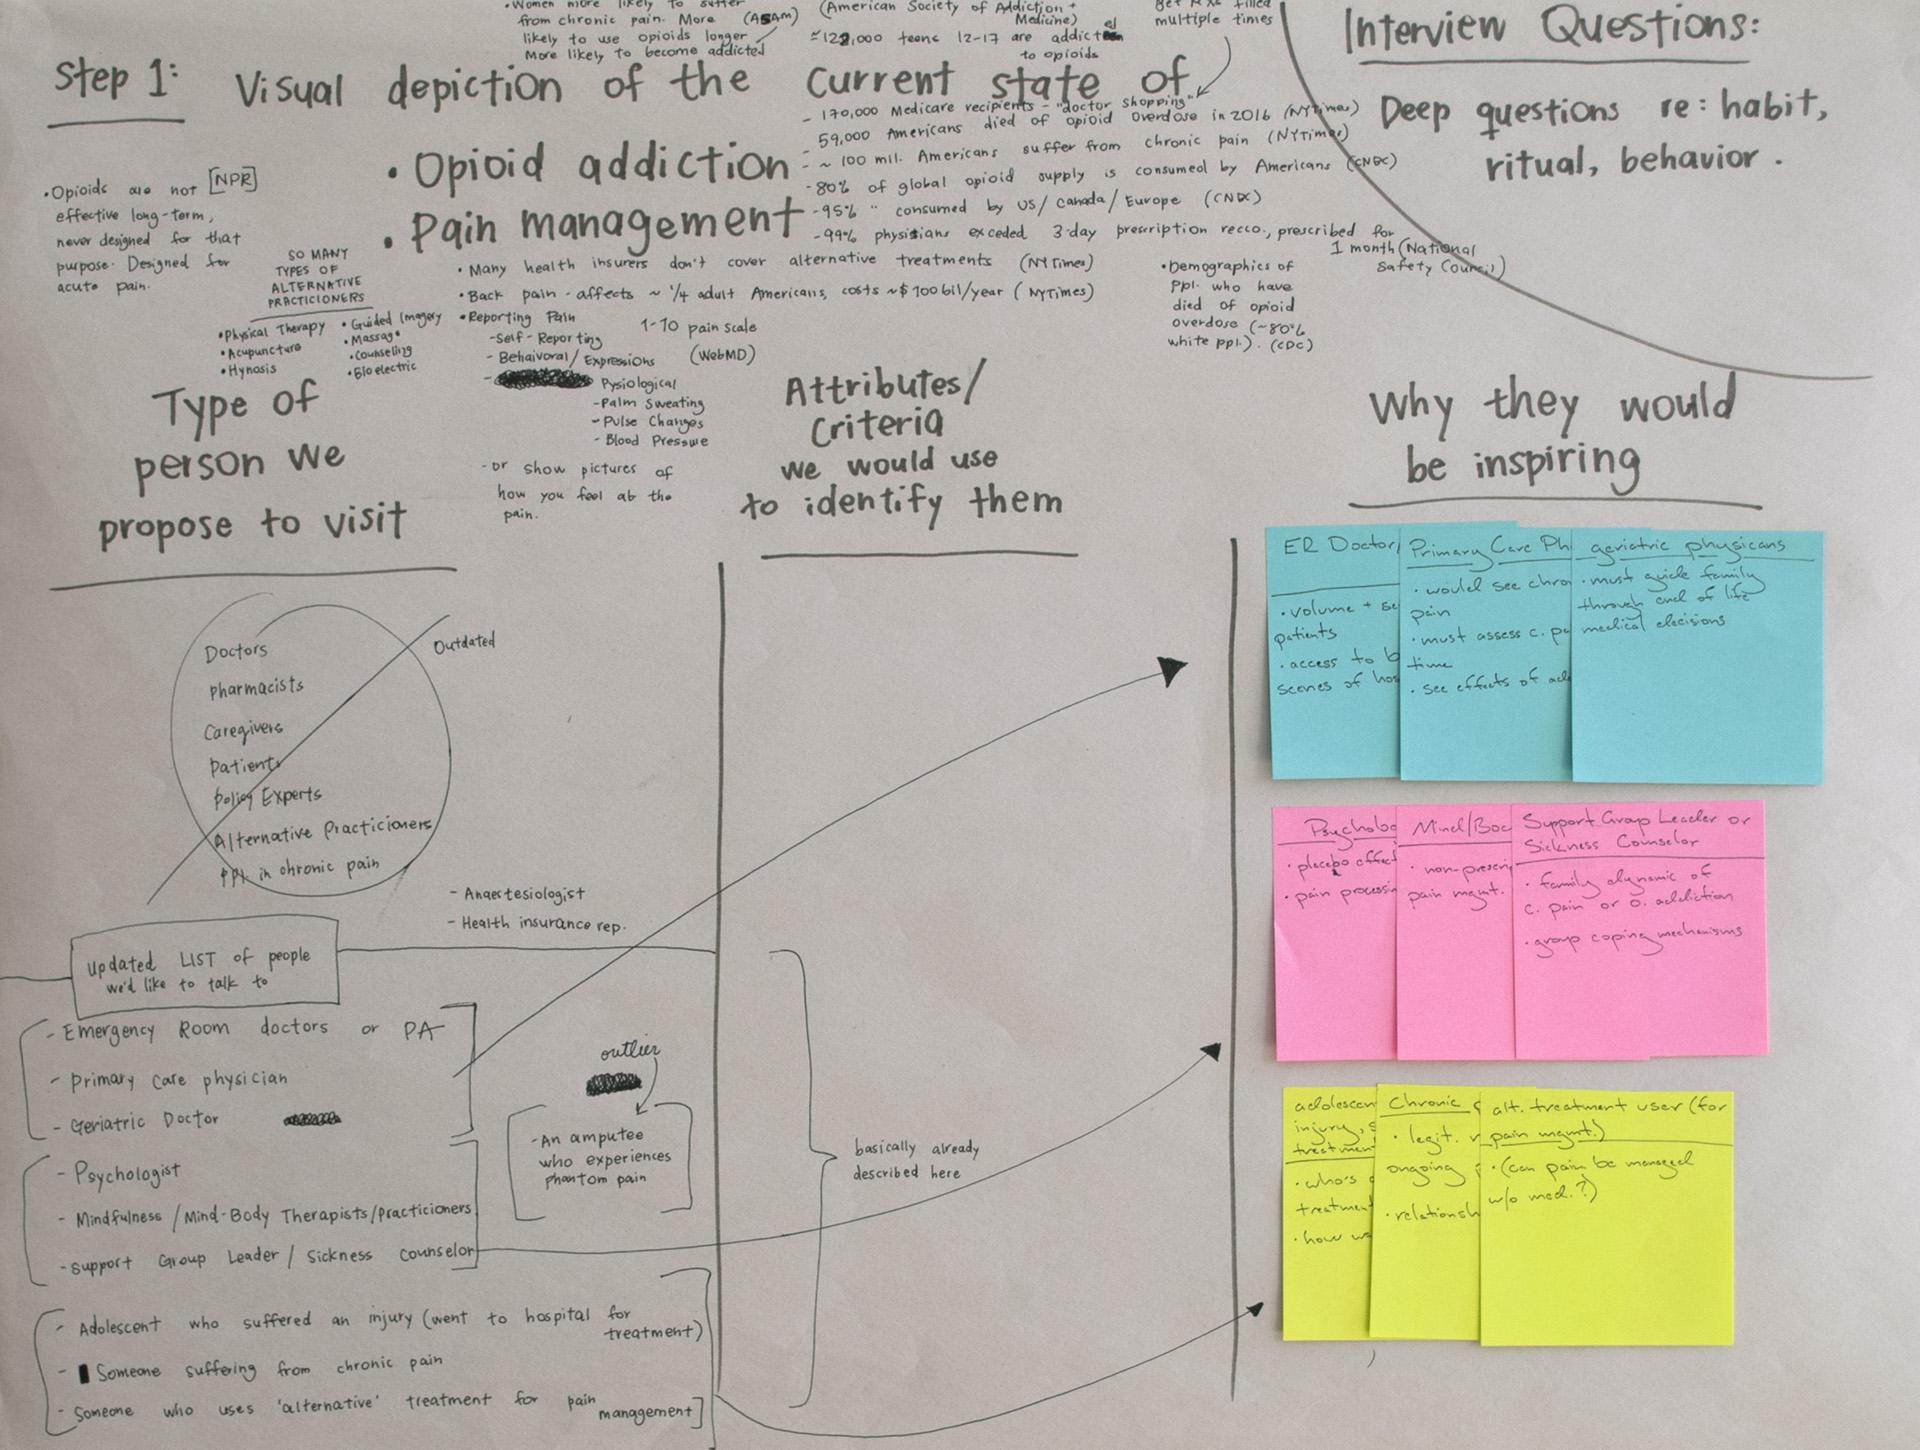 Oct 16_Rough research plan.jpg